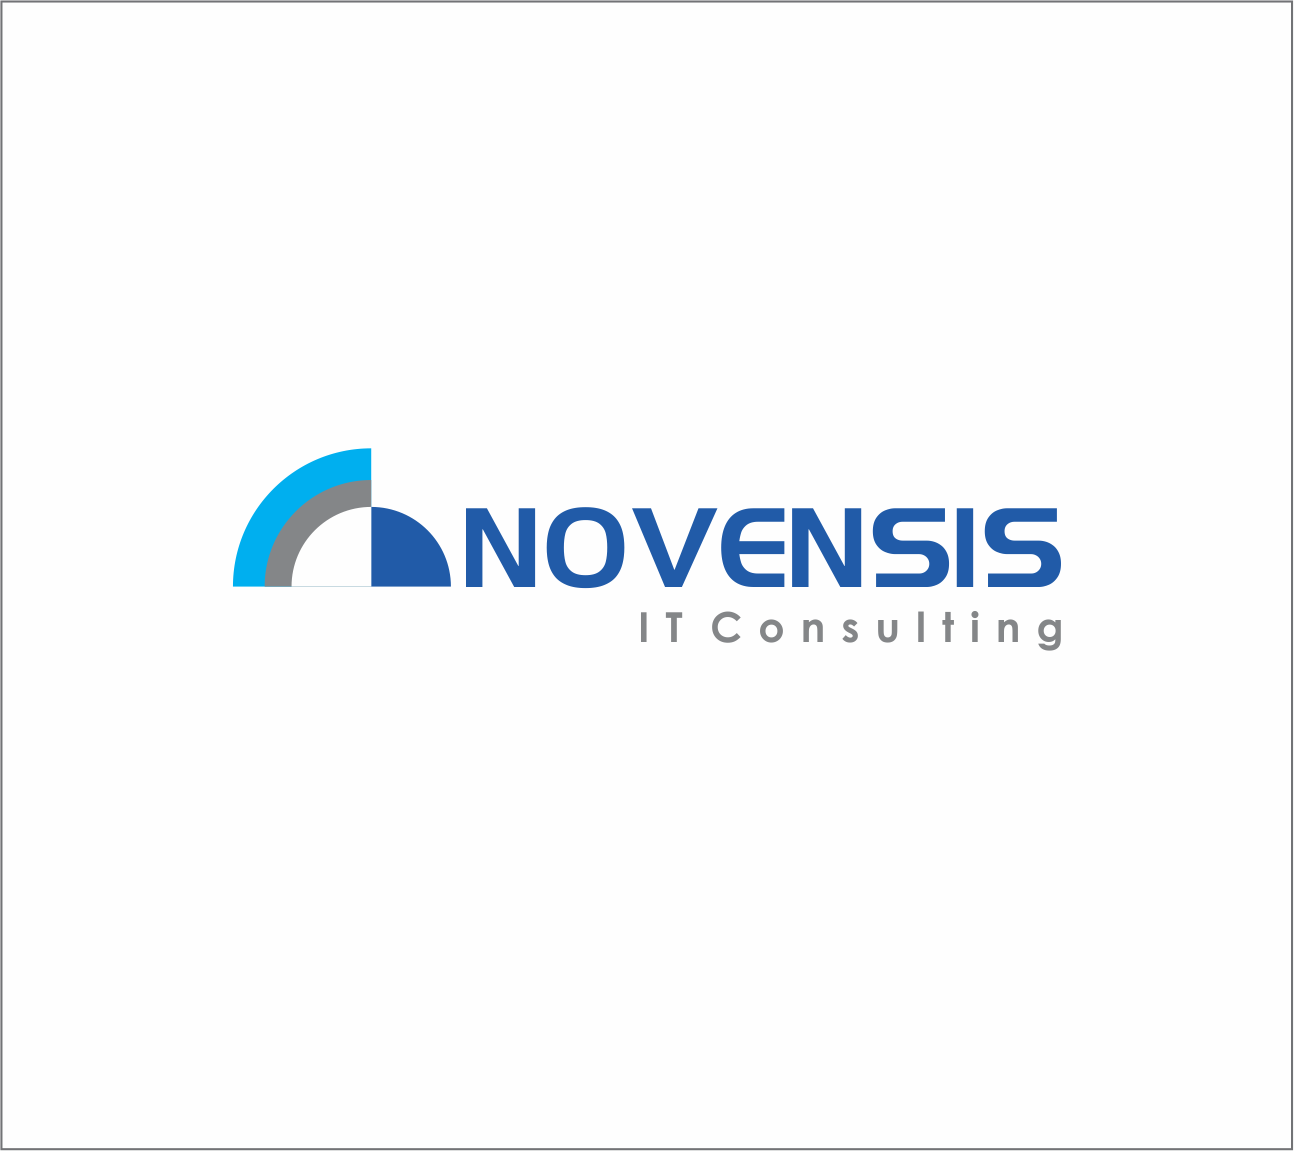 Logo Design by Armada Jamaluddin - Entry No. 176 in the Logo Design Contest Novensis Logo Design.